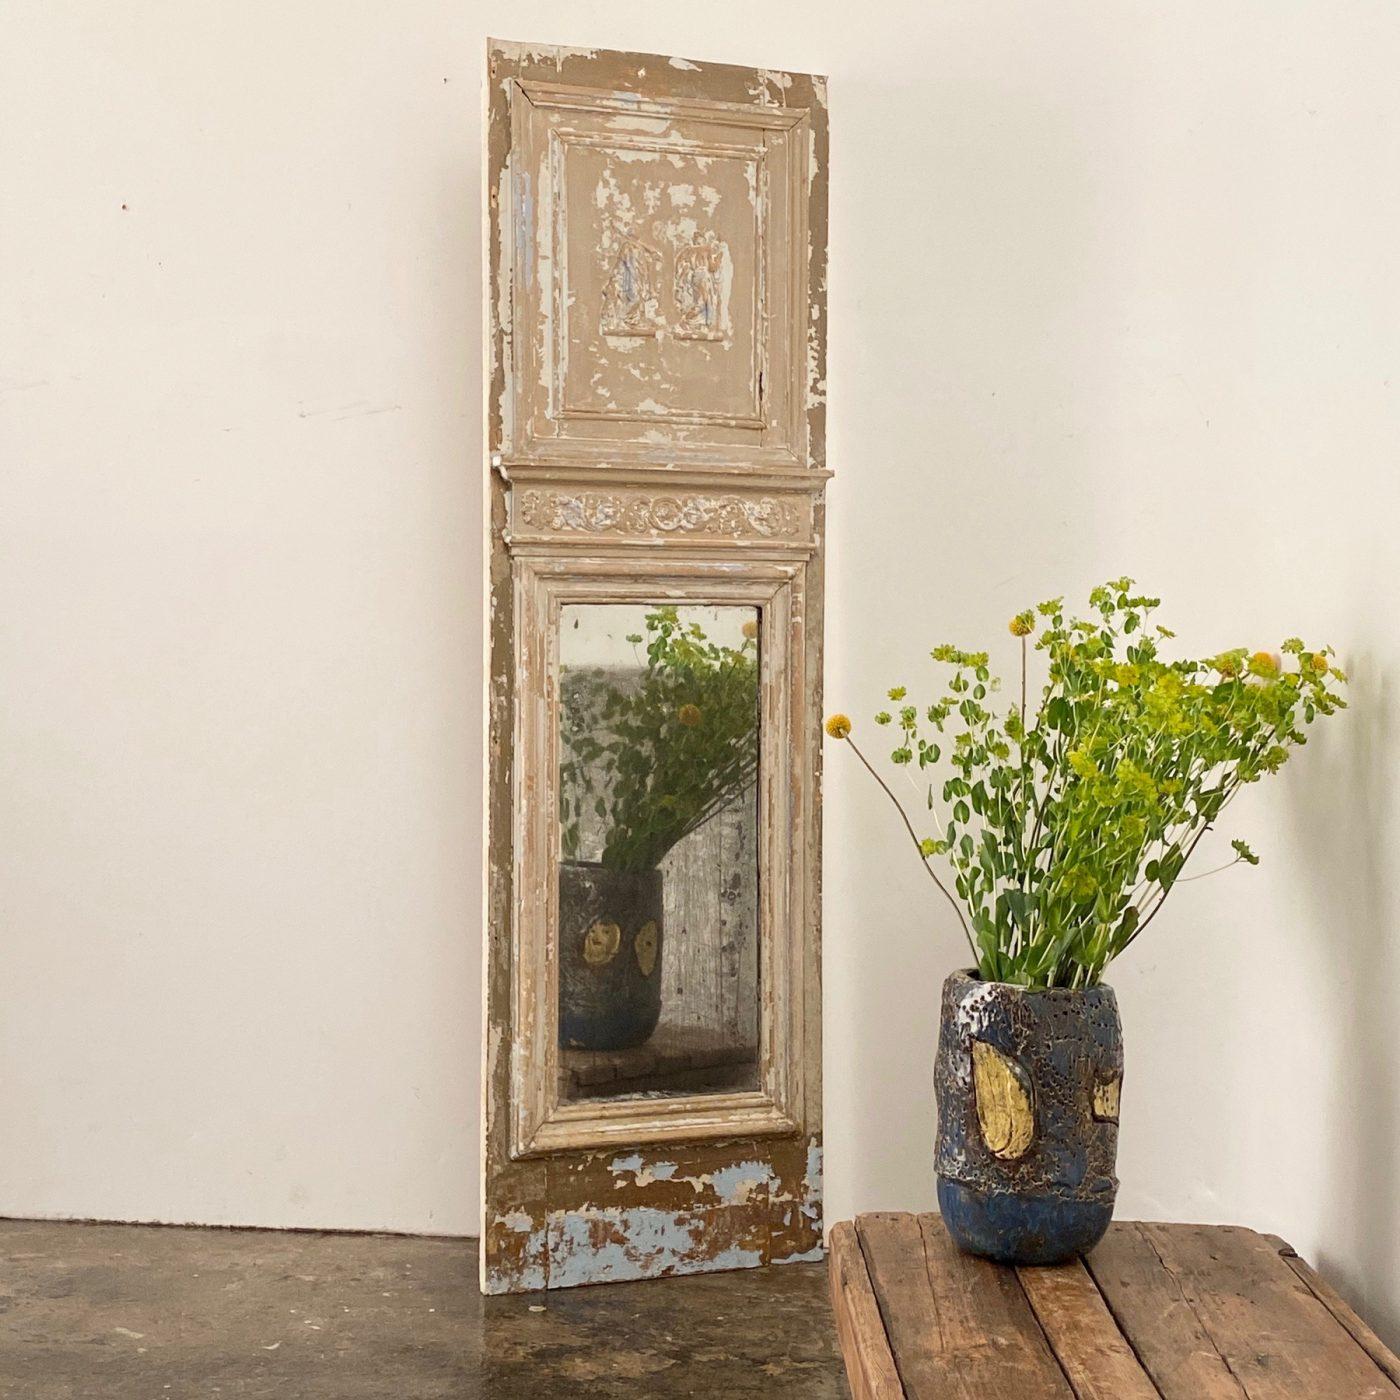 objet-vagabond-painted-mirror0003